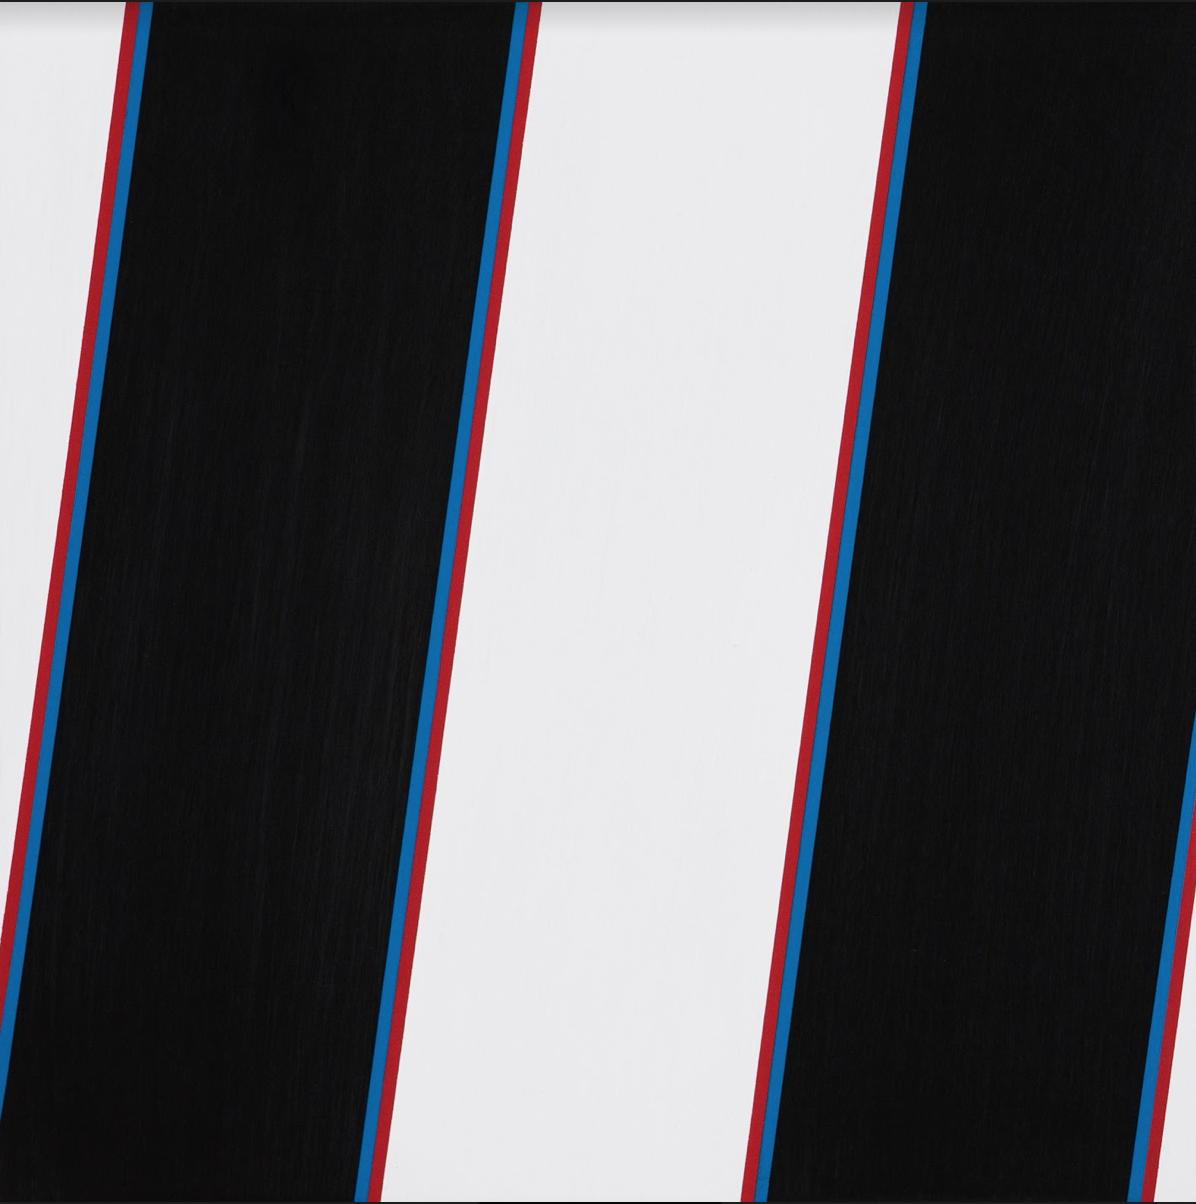 "Stripes 2, 36"" x 36"", Acrylic latex on panel, 2017"